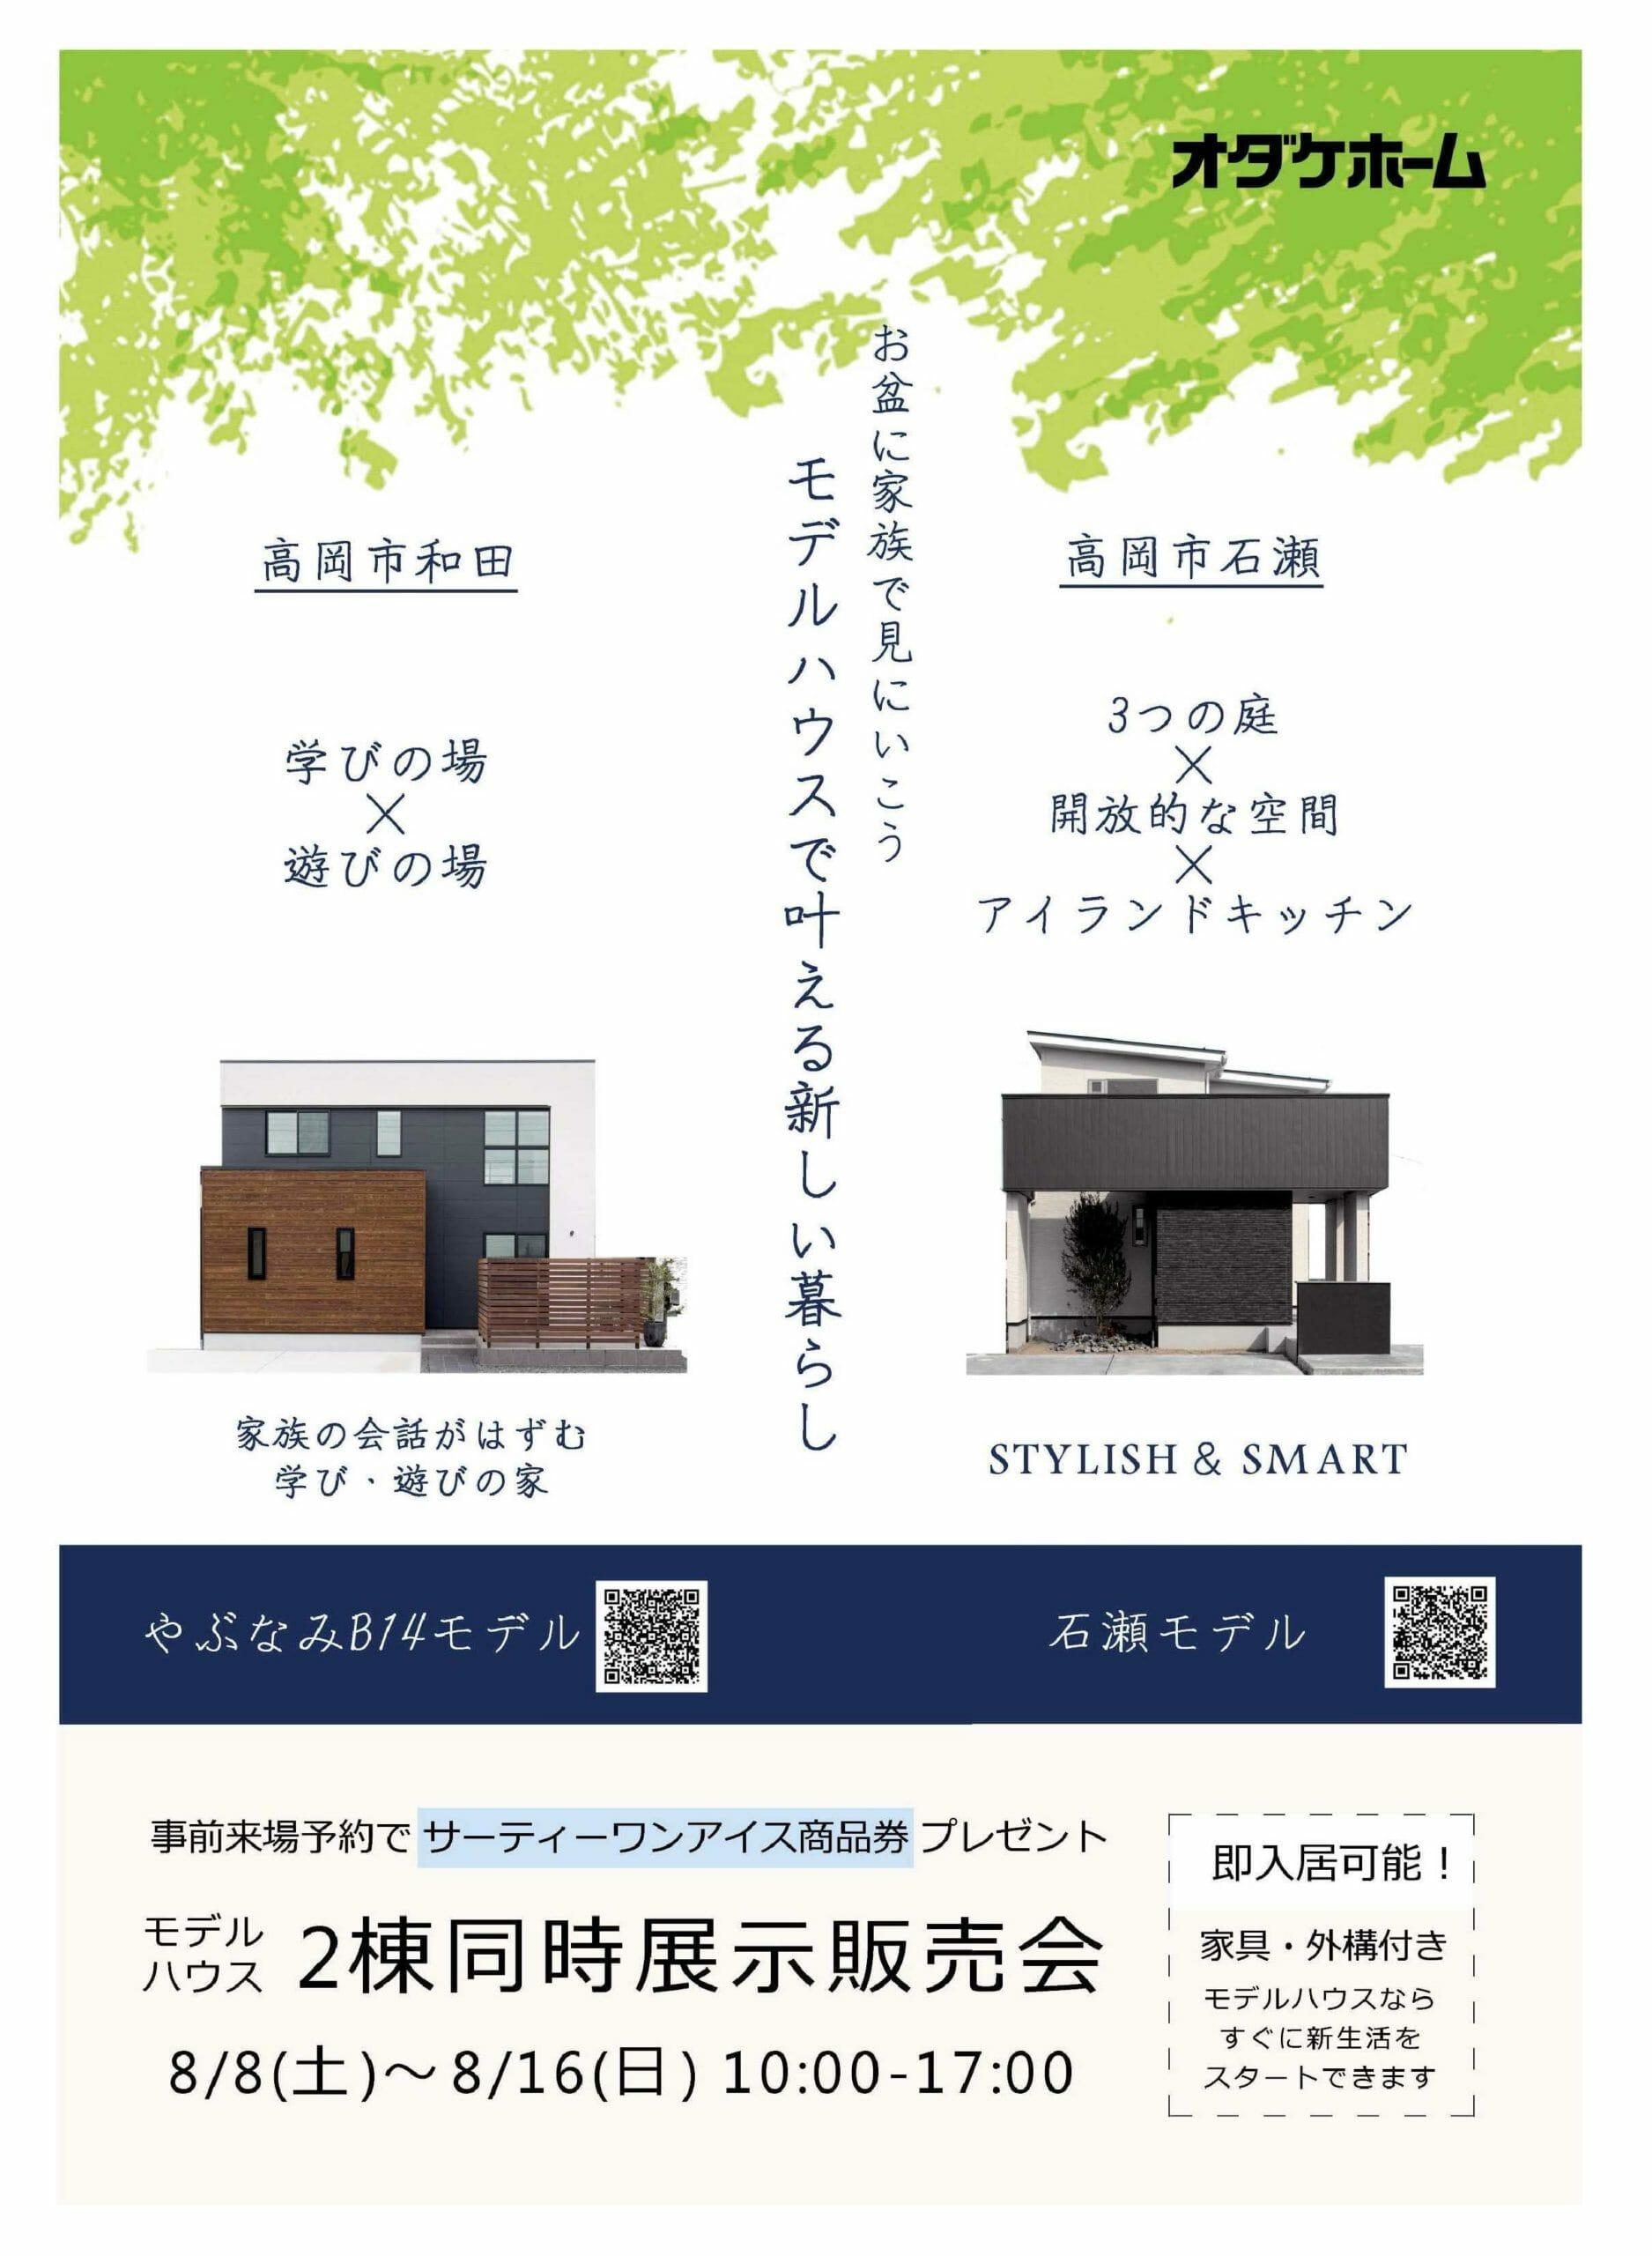 8/8(土)~16(日)高岡市内モデルハウス2会場同時展示販売会~石瀬・和田~